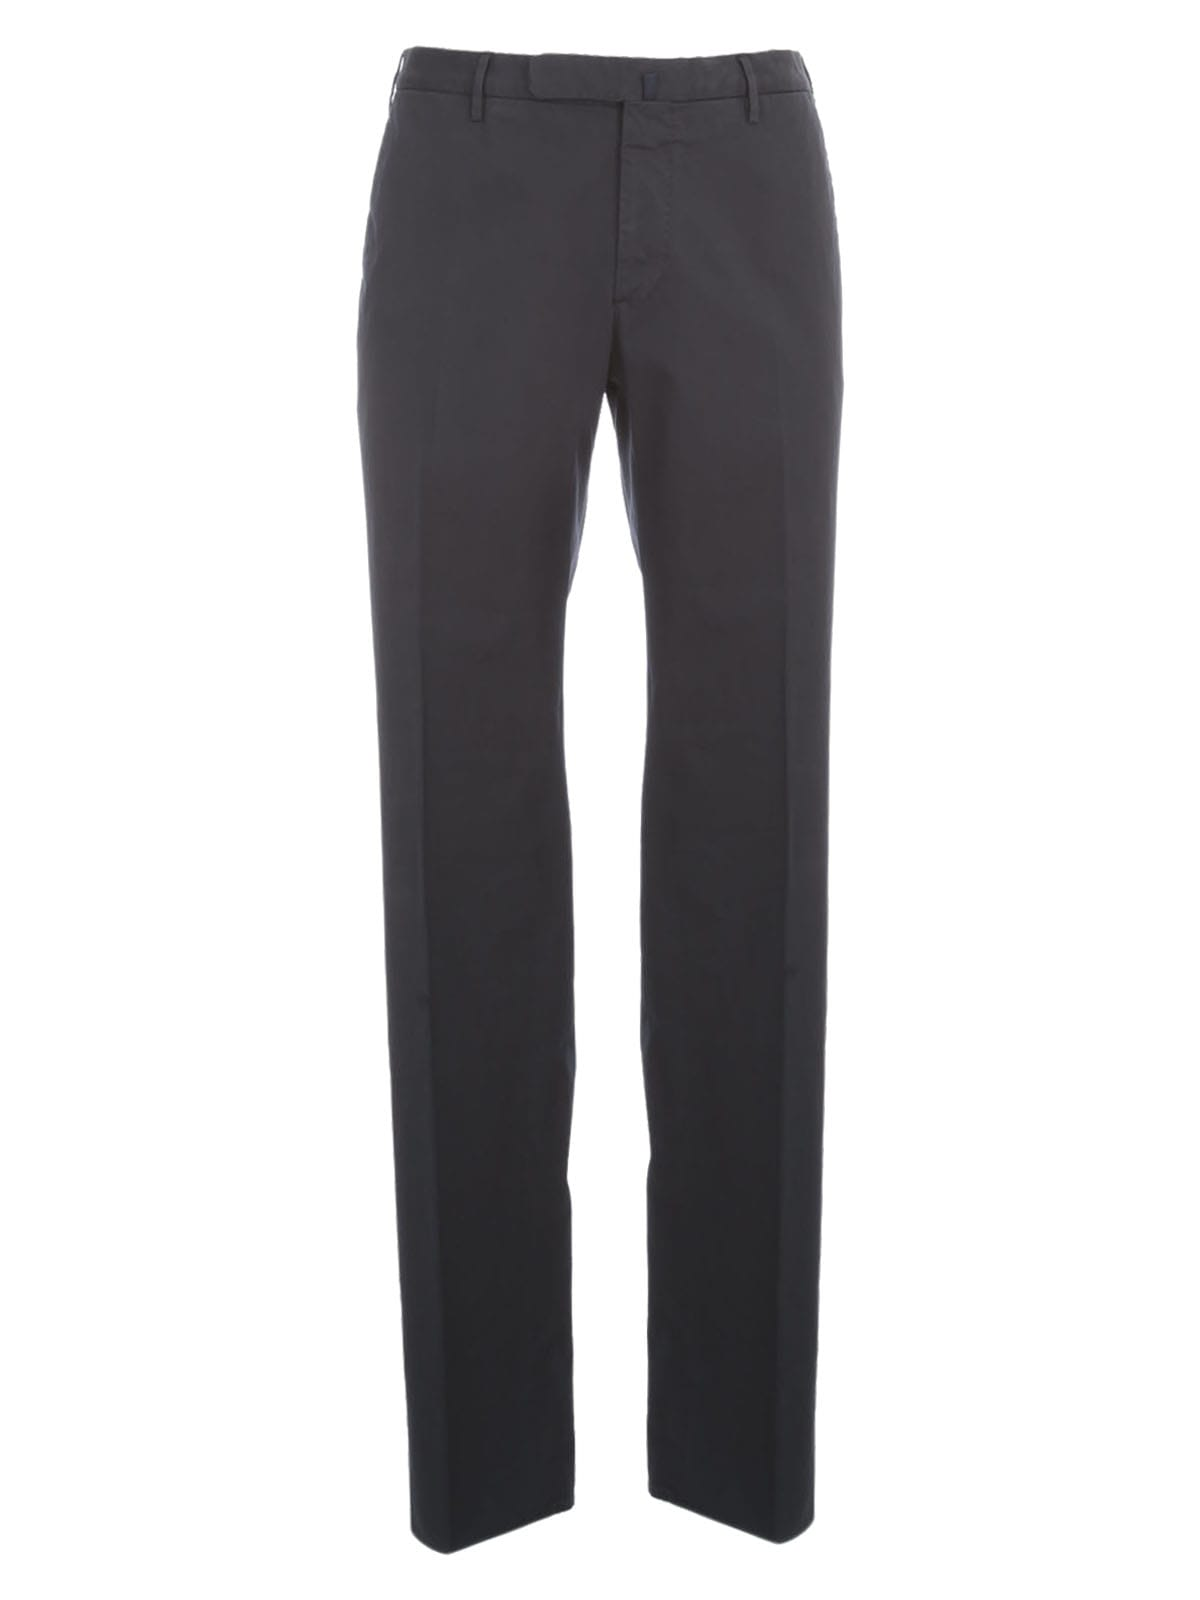 Incotex Slim Fit Pants Side Pockets